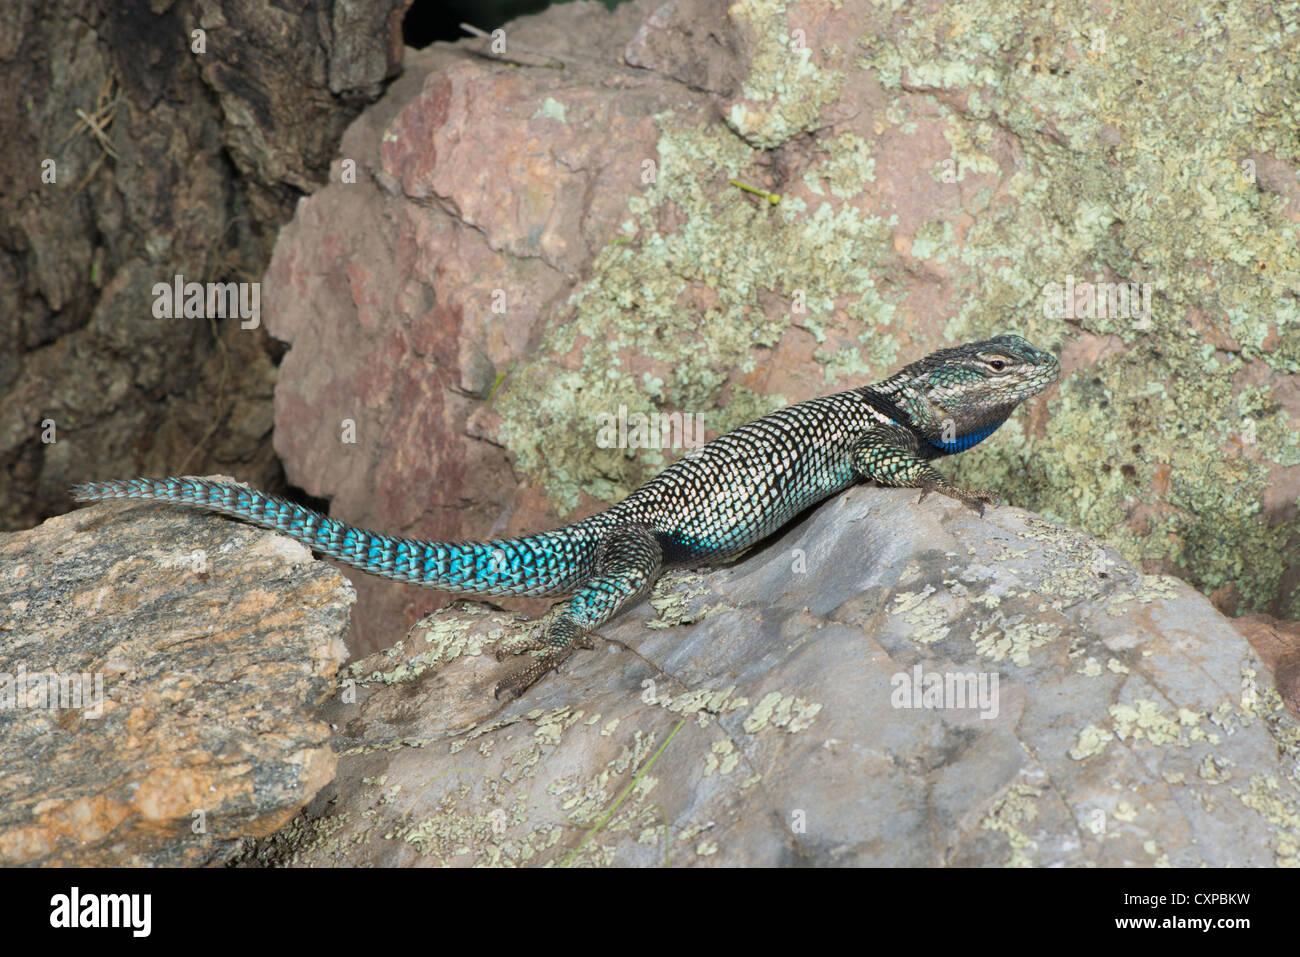 Arizona cochise county cochise -  Mountain Spiny Lizard Sceloporus Jarrovii Huachuca Mountains Cochise County Arizona United States 9